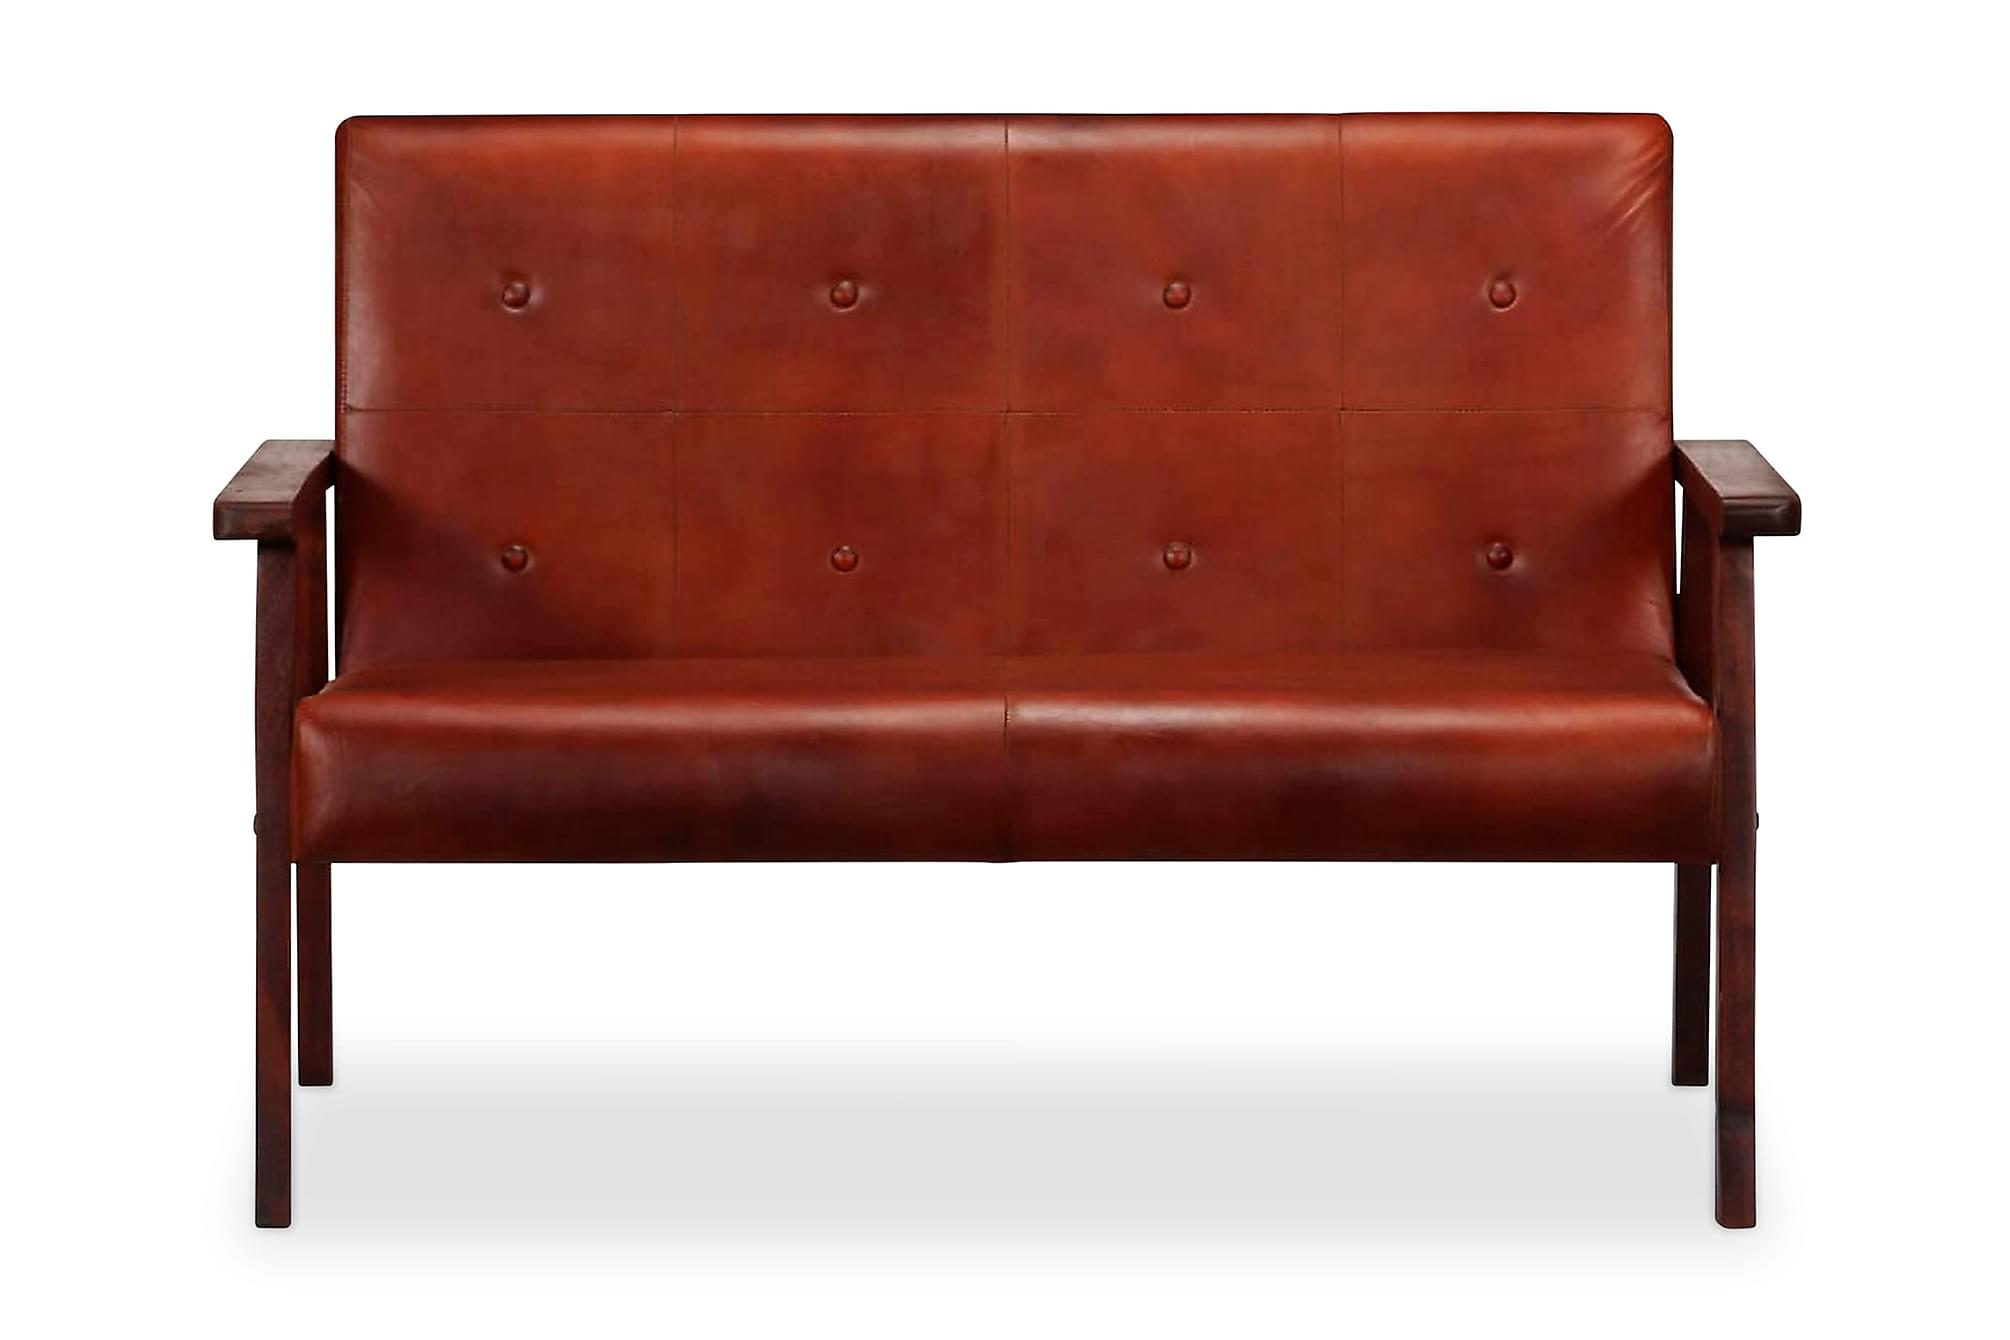 2-sitssoffa brun äkta läder, Skinnsoffor